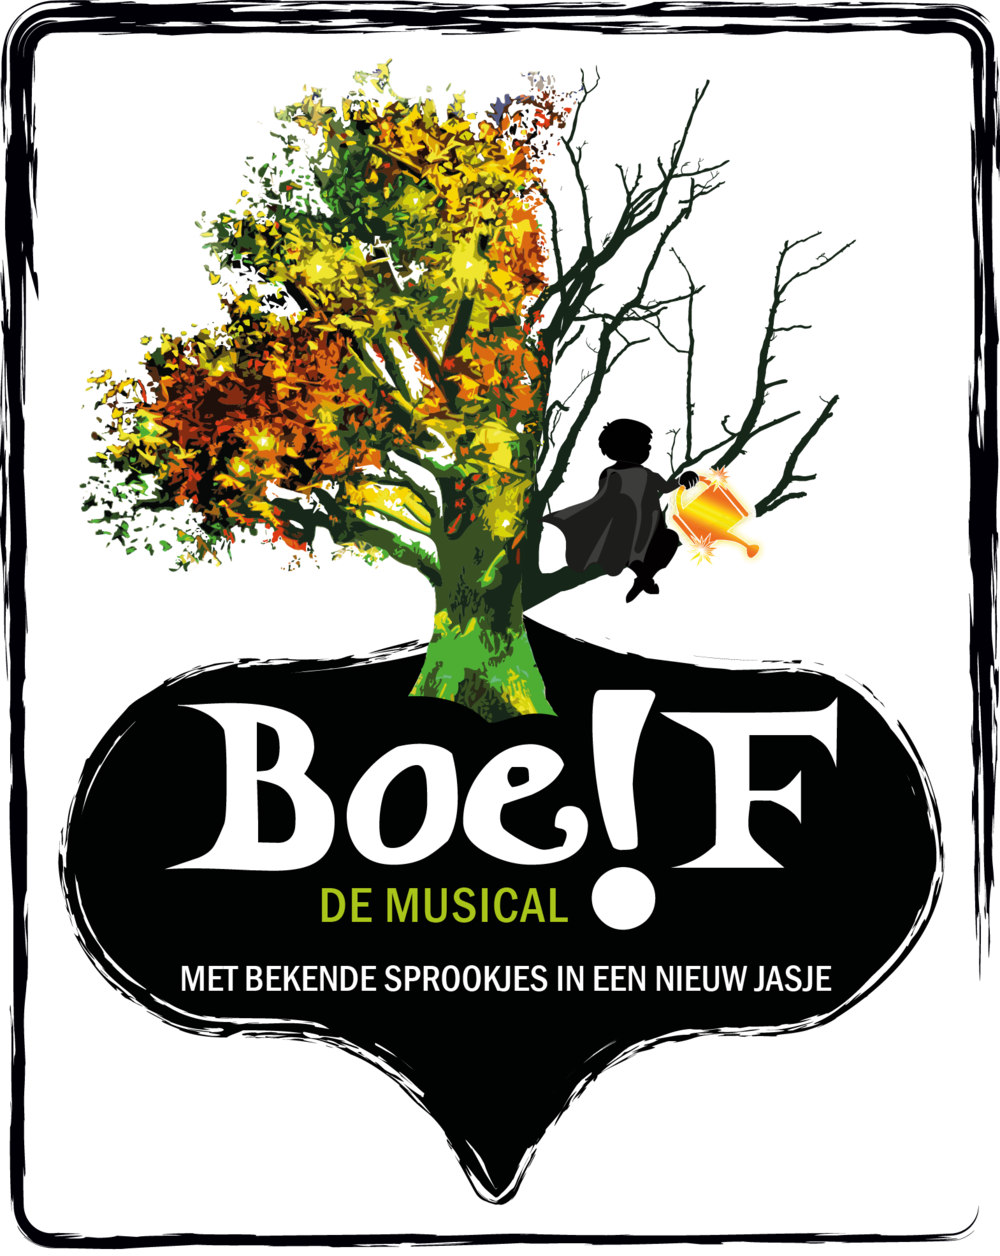 LOGO Boe!F de MusicalDONKERWIT.png